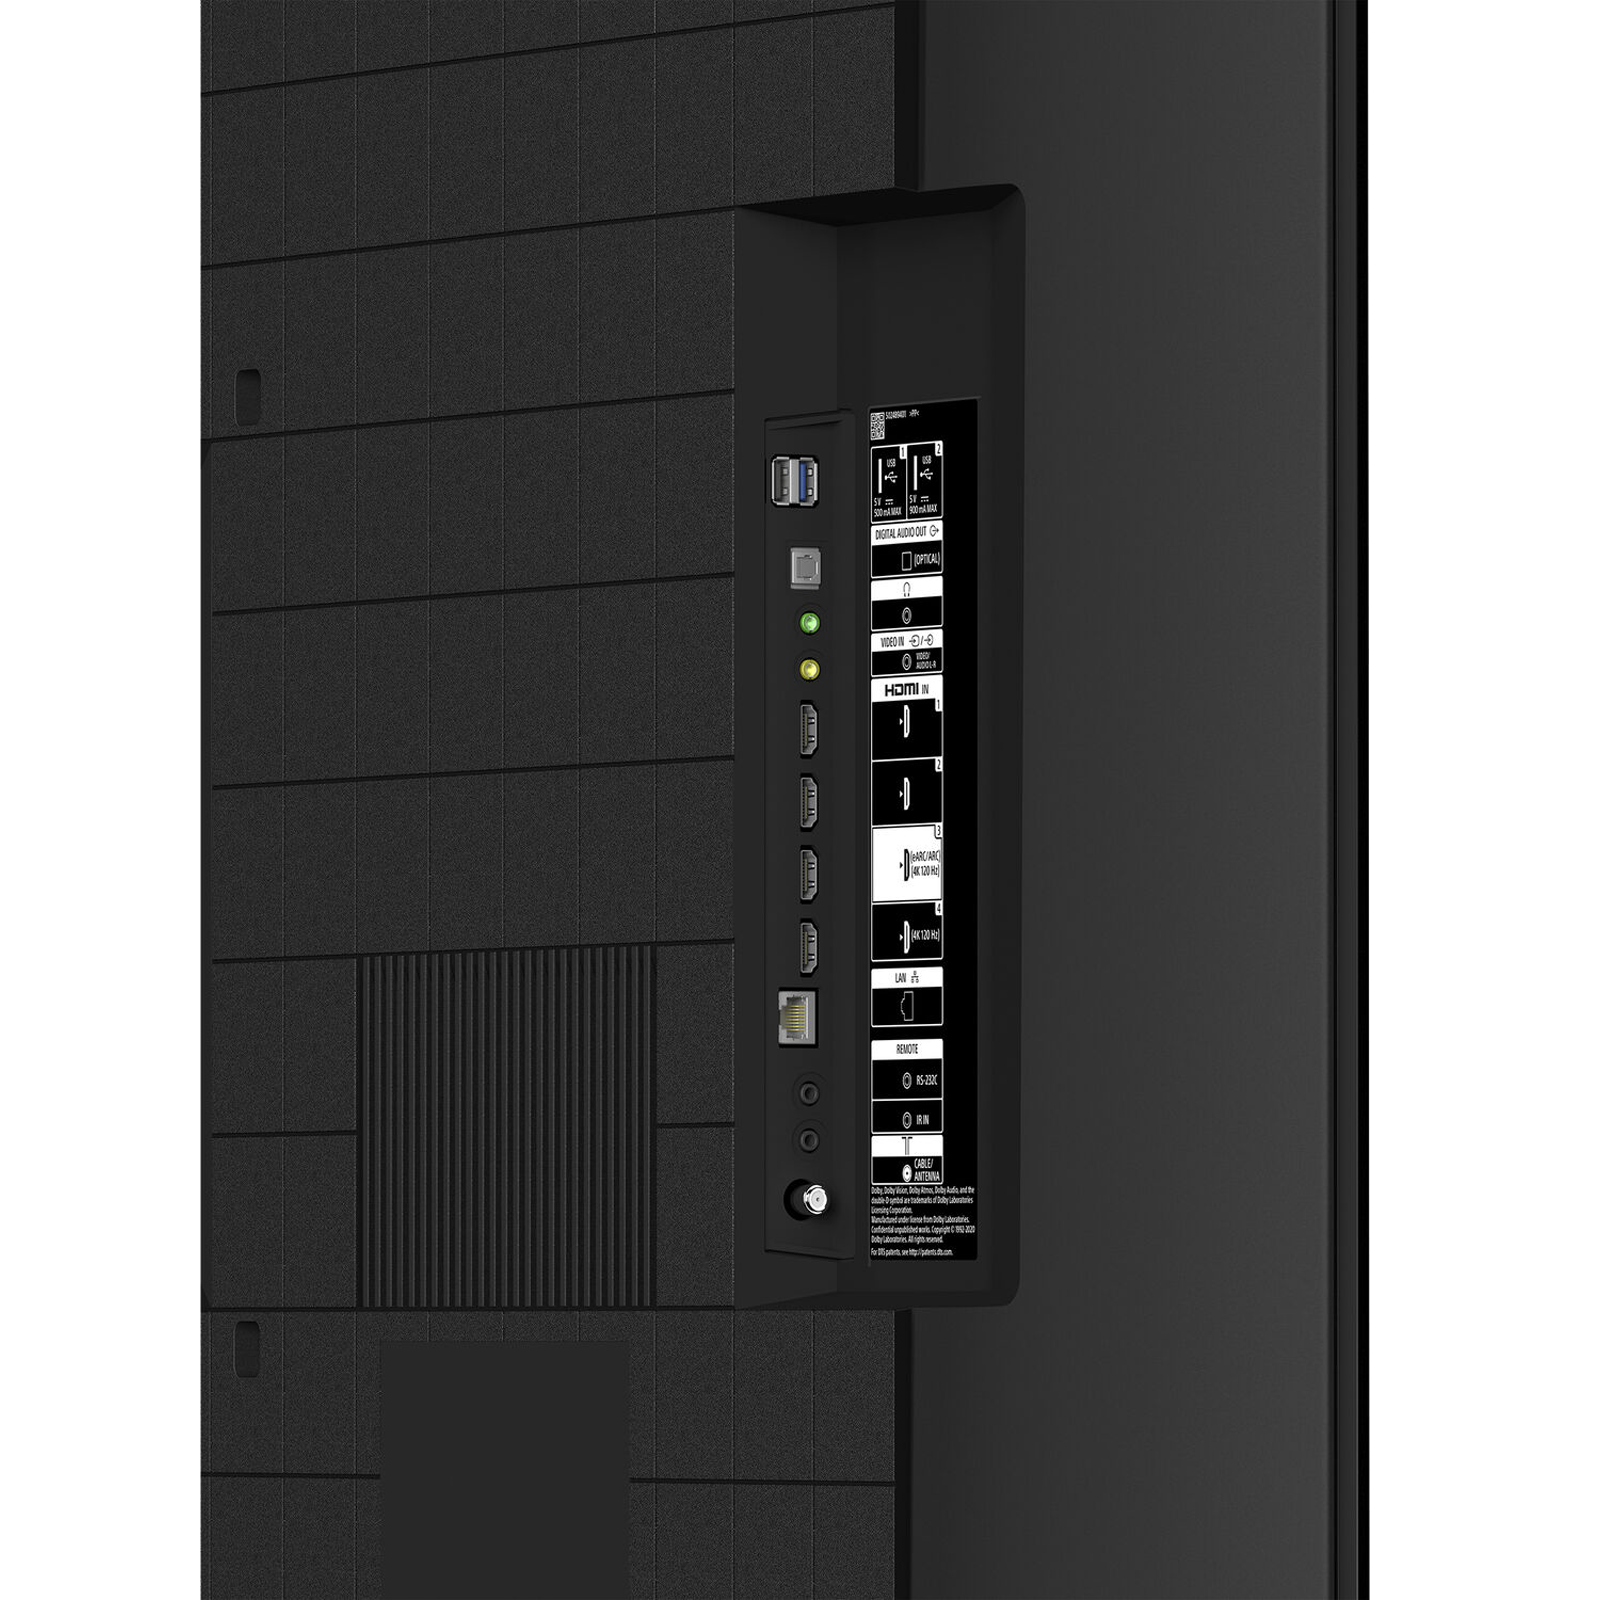 Sony Bravia X90J Series139cm (55 Inch) Ultra HD 4K Full Array LED Google Smart TV (XR Cognitive Processor, XR-55X90J, Black) 5